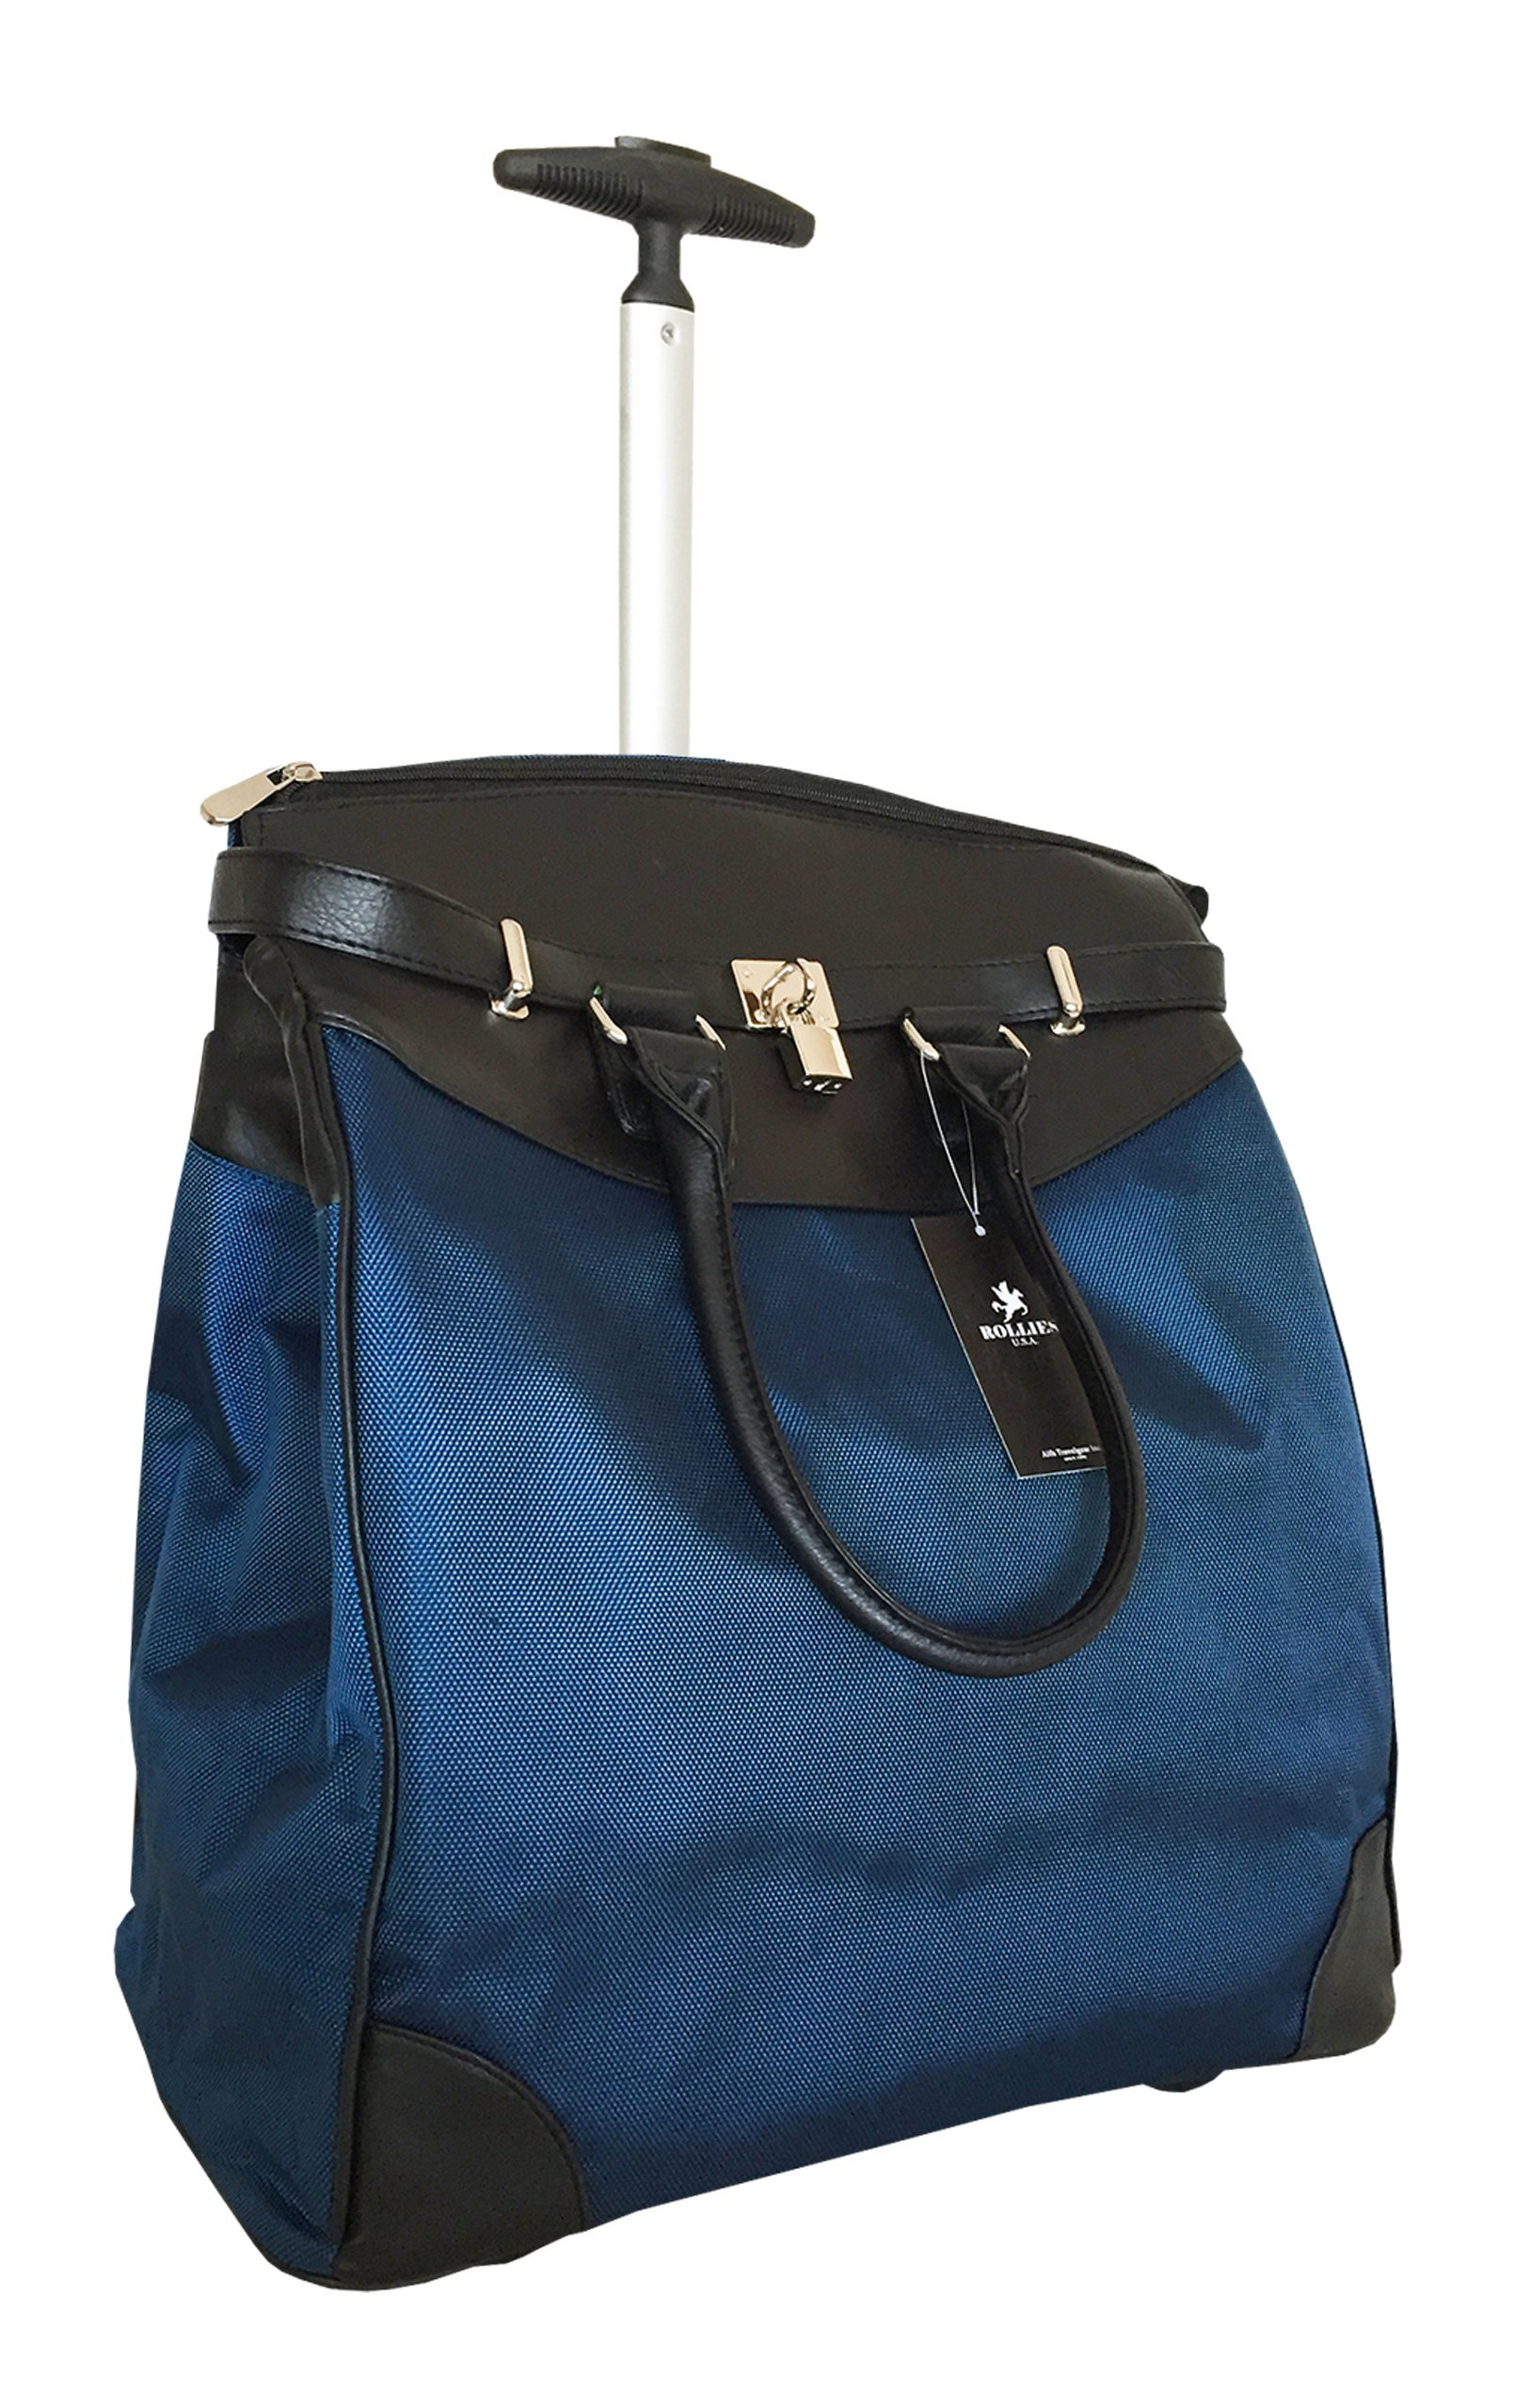 Trendy Flyer Computer/Laptop Rolling Bag 2 Wheel Case Plain Blue